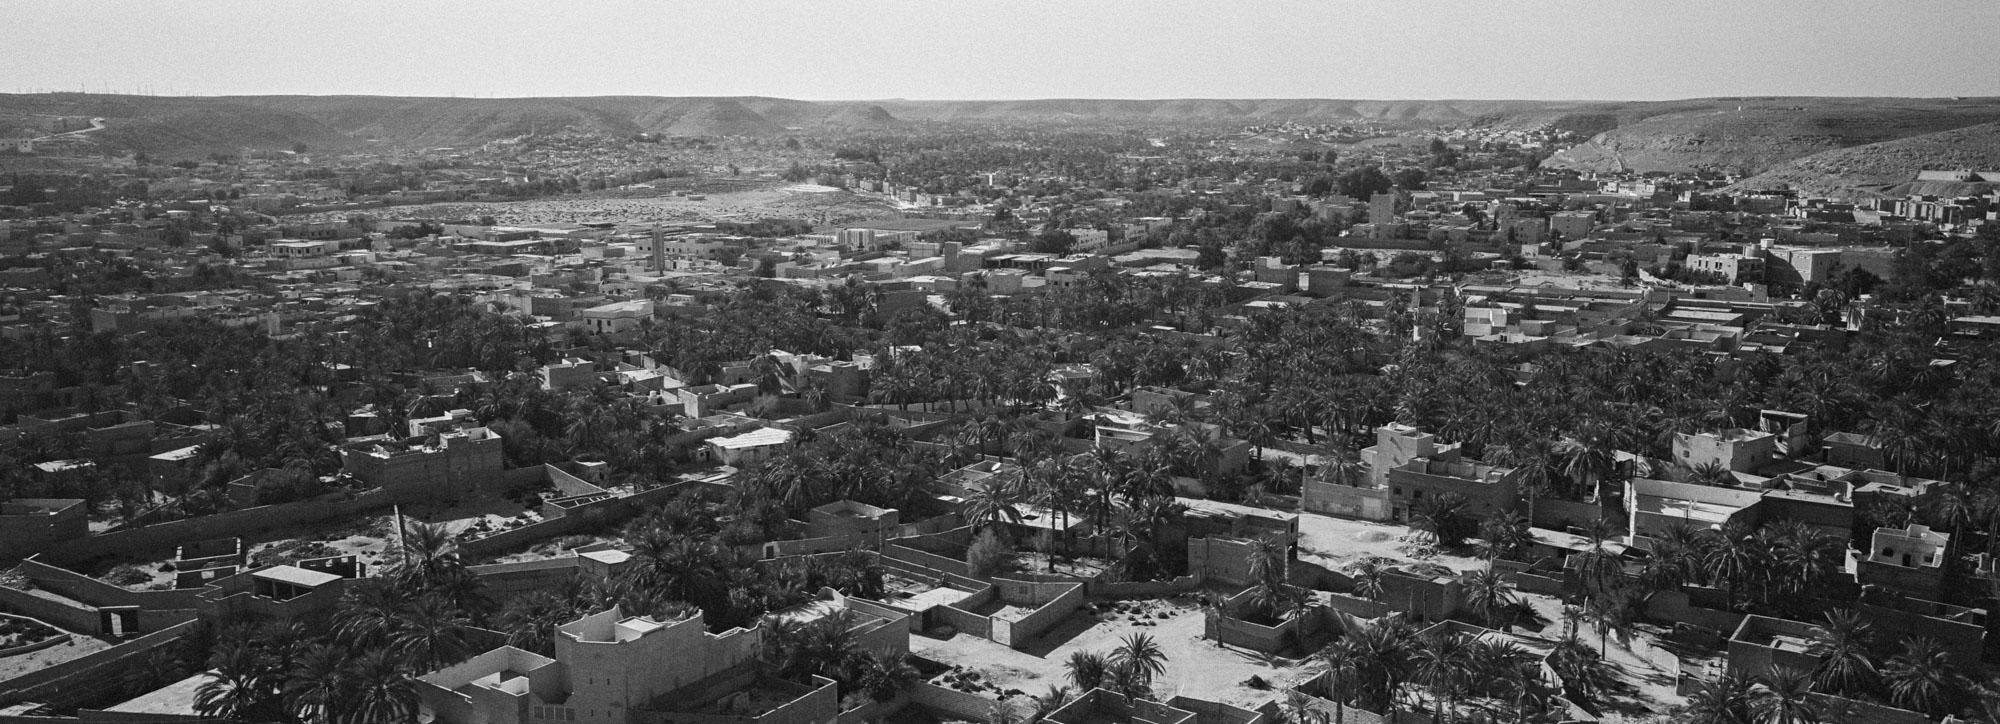 Vue sur la grande palmeraie de Ghardaia. 2/02/2016, Ghardaïa-Algérie.